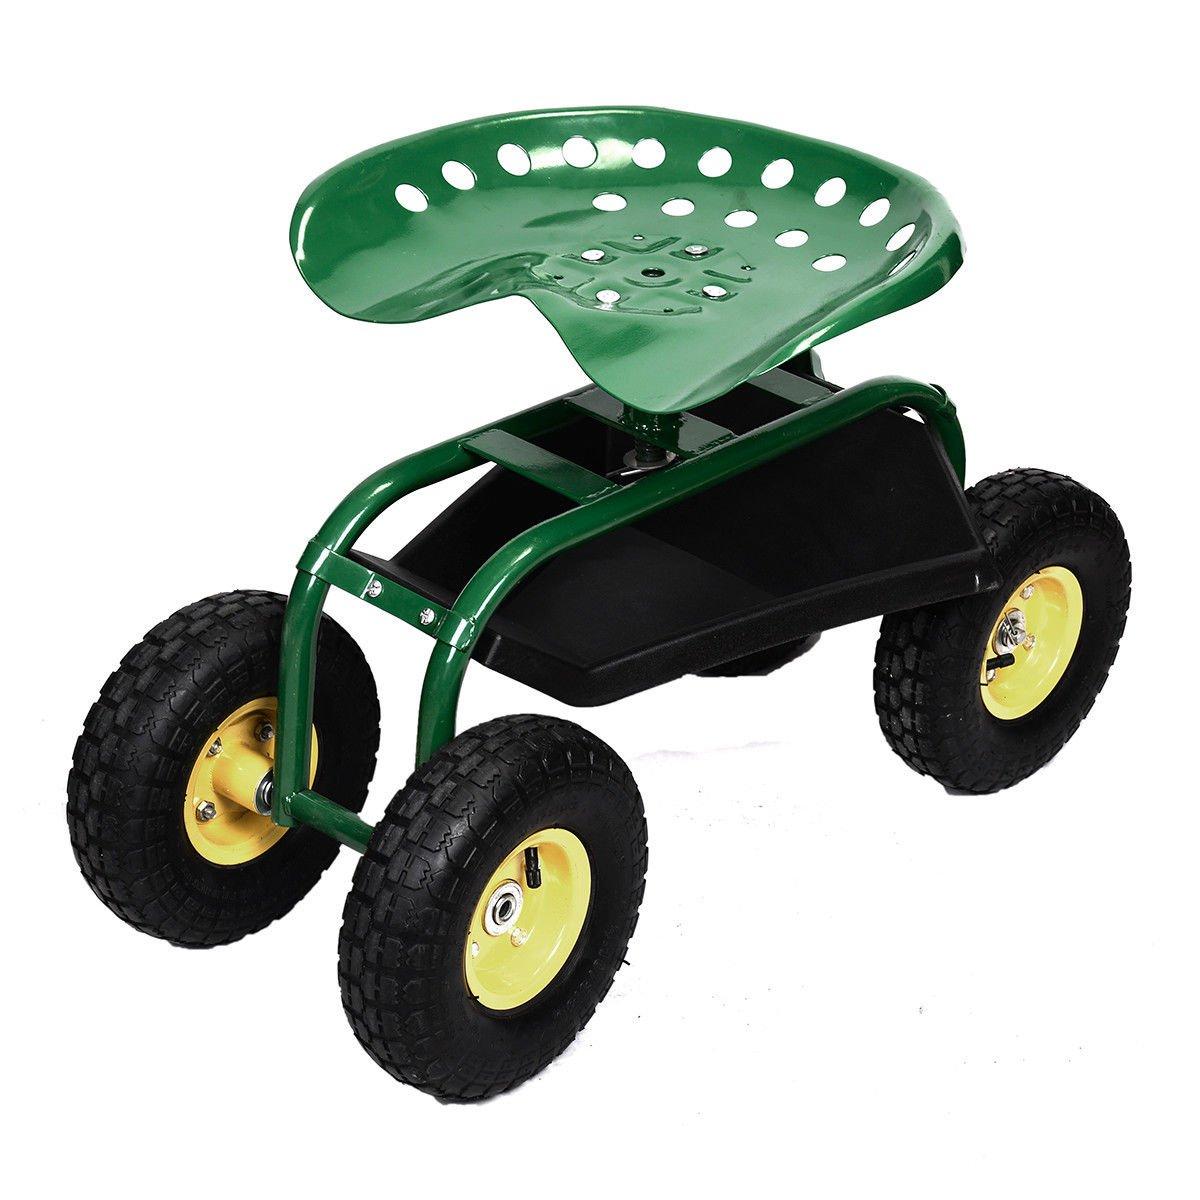 Amazing Amazon.com : Green/red Garden Cart Rolling Work Seat With Heavy Duty Tool  Tray Gardening Planting (green) : Patio, Lawn U0026 Garden